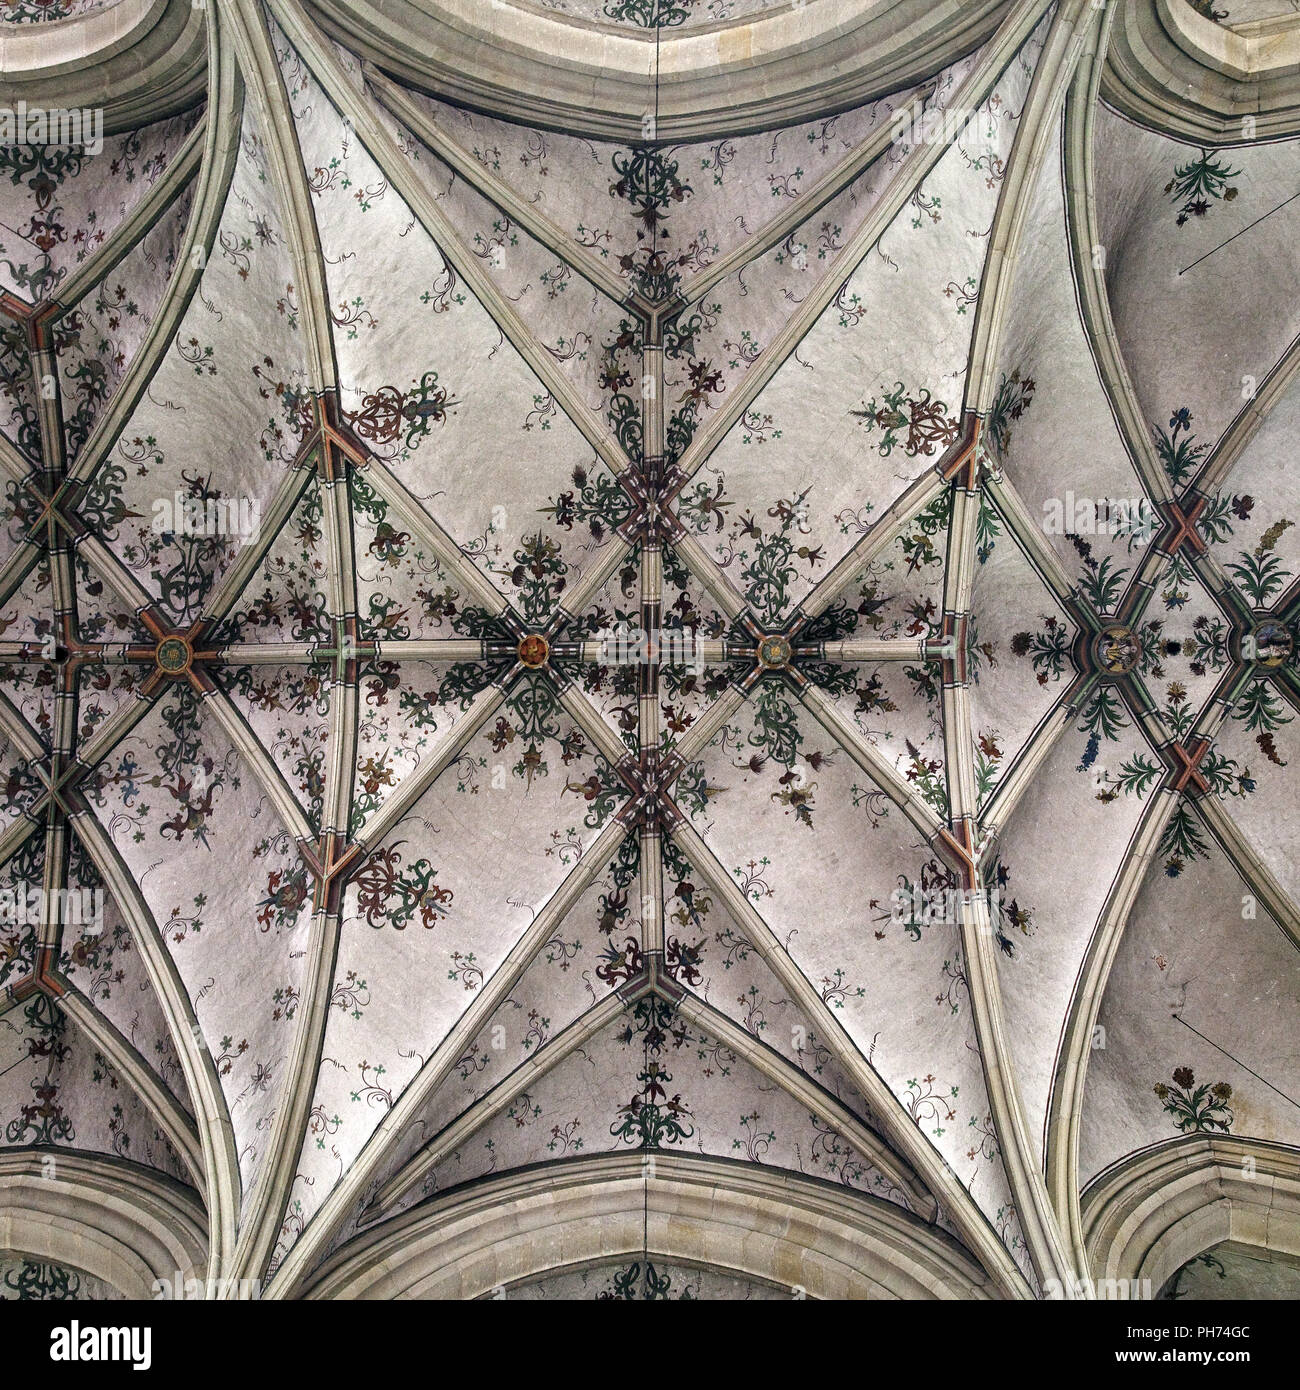 Decke, Pfarrkirche, Nottuln, Deutschland Stockbild